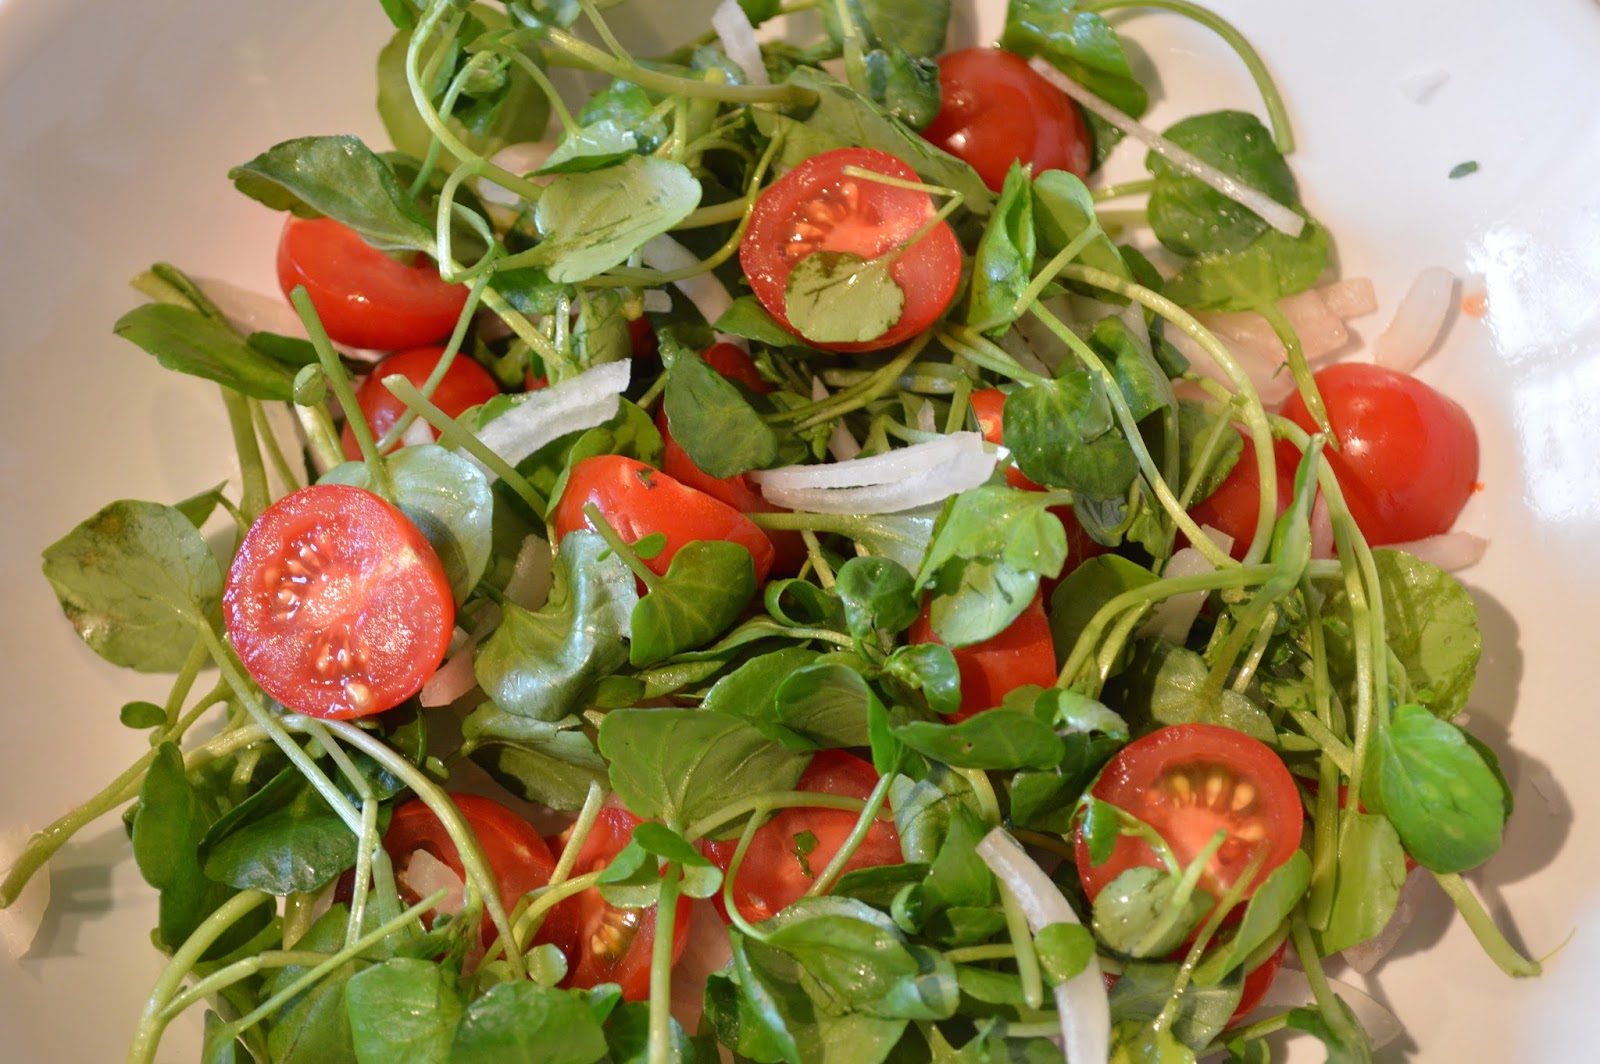 Tomato watercress and shallot salad